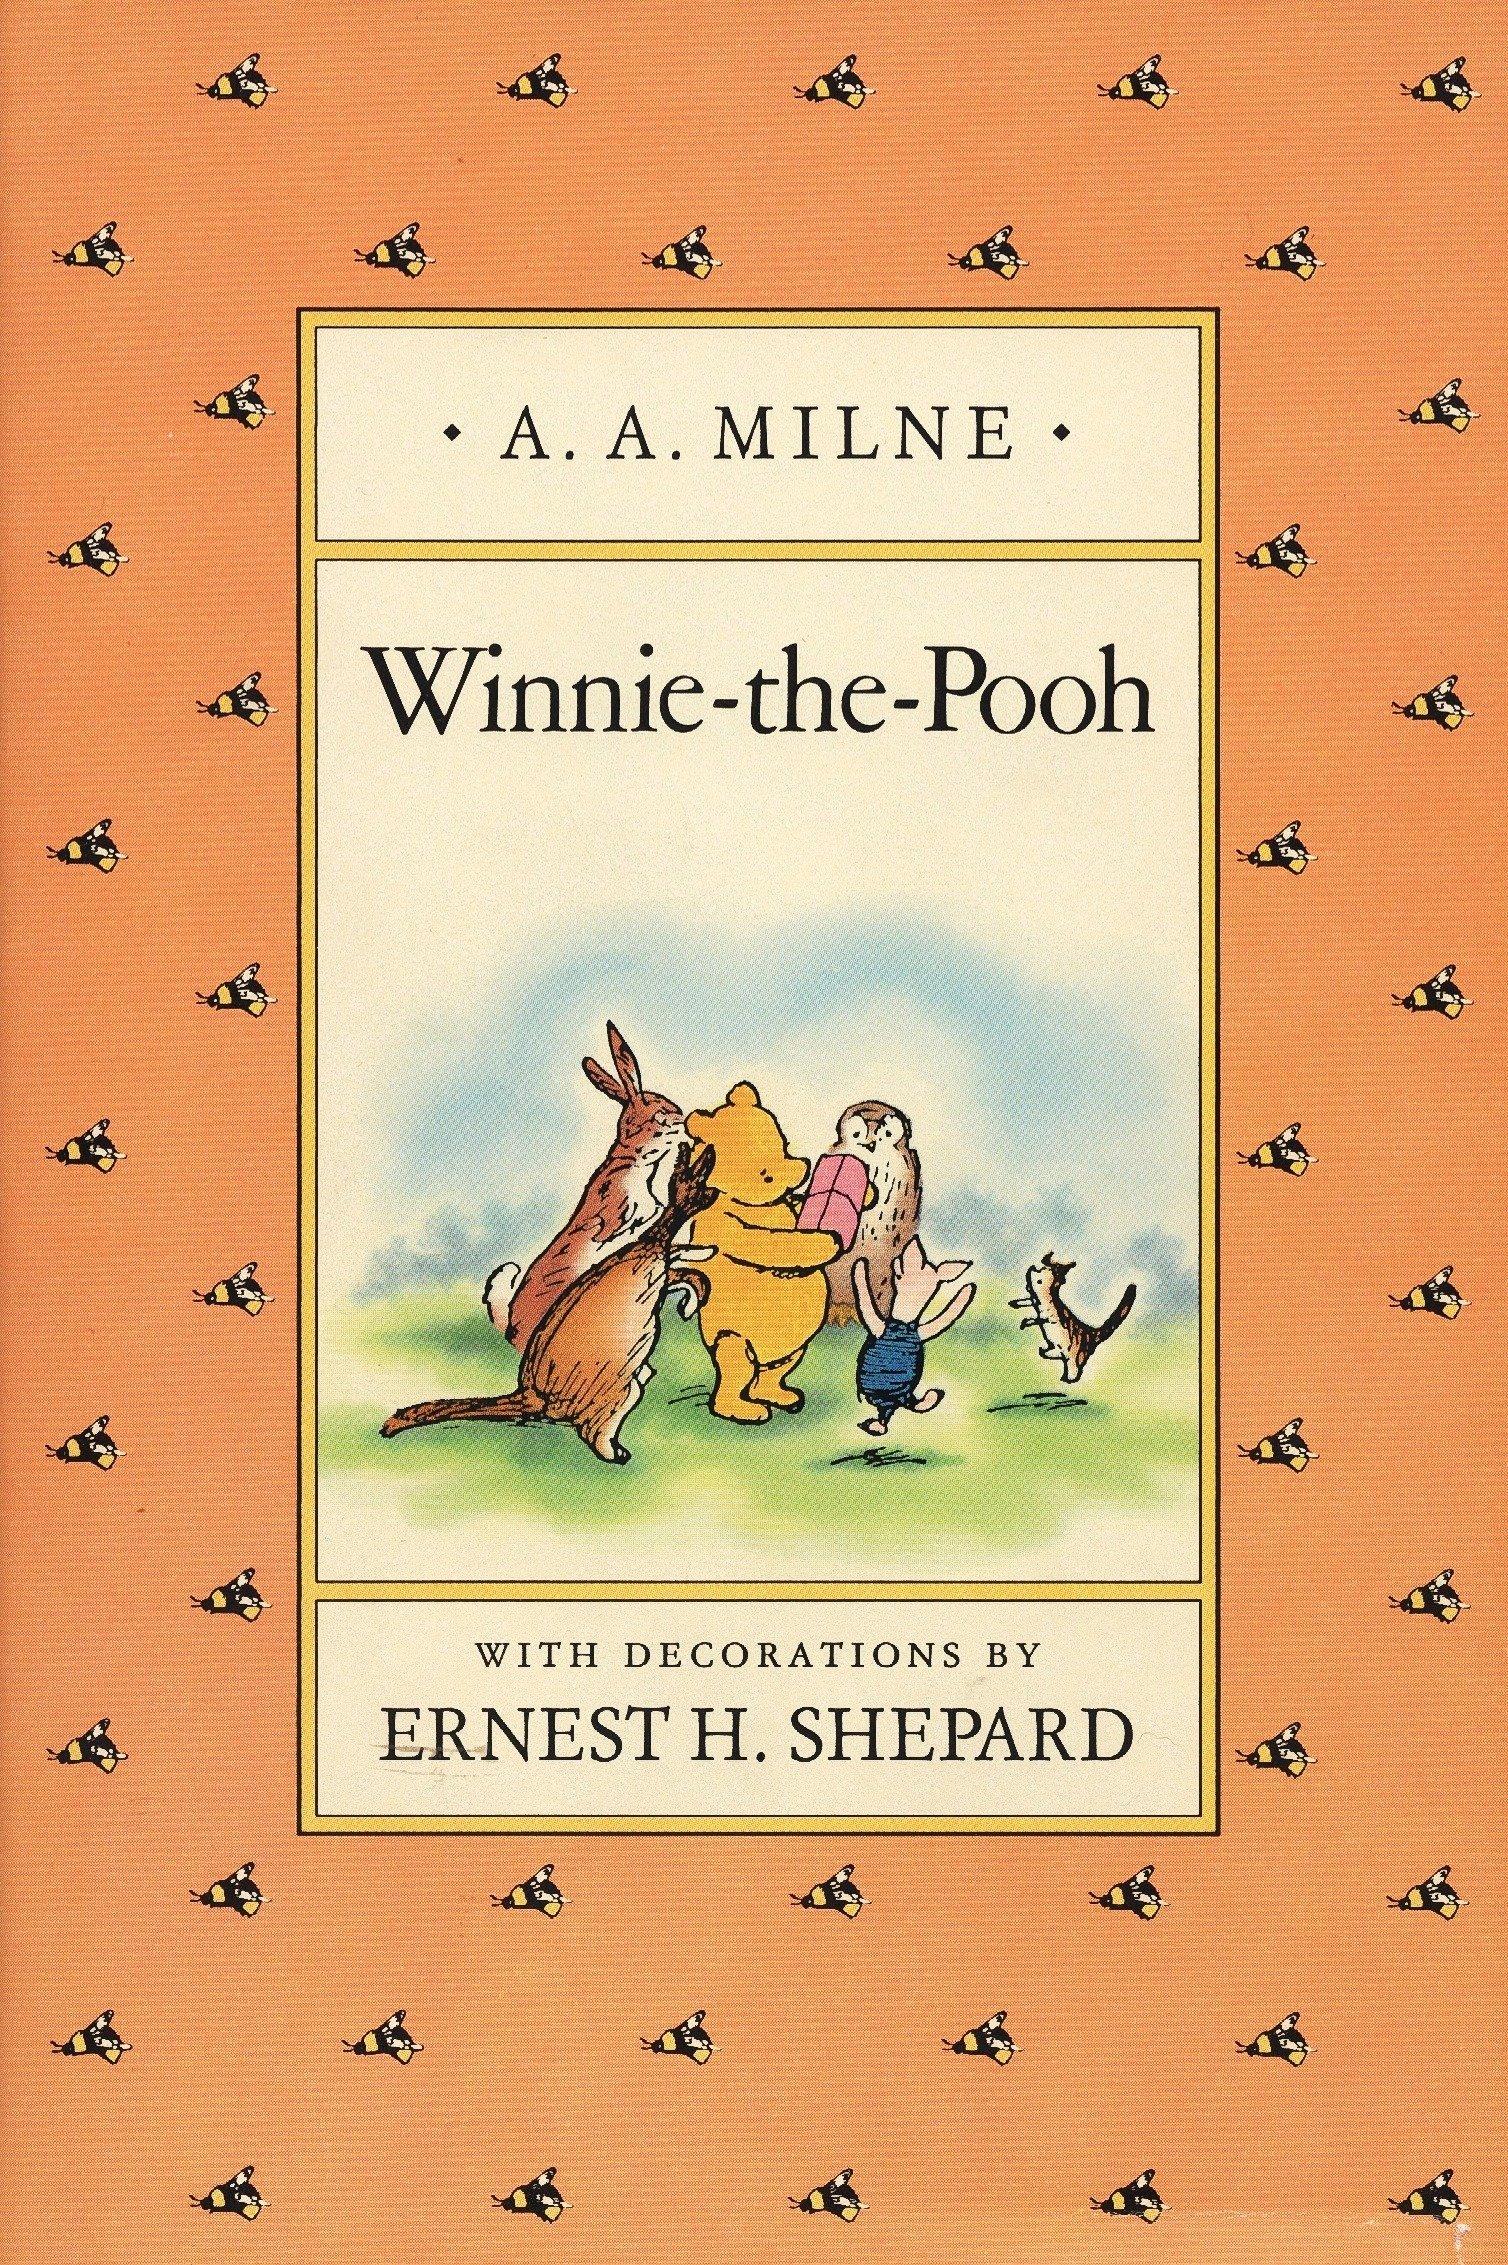 Winnie-the-Pooh: Milne, A. A., Shepard, Ernest H.: 9780525444435: Amazon.com: Books